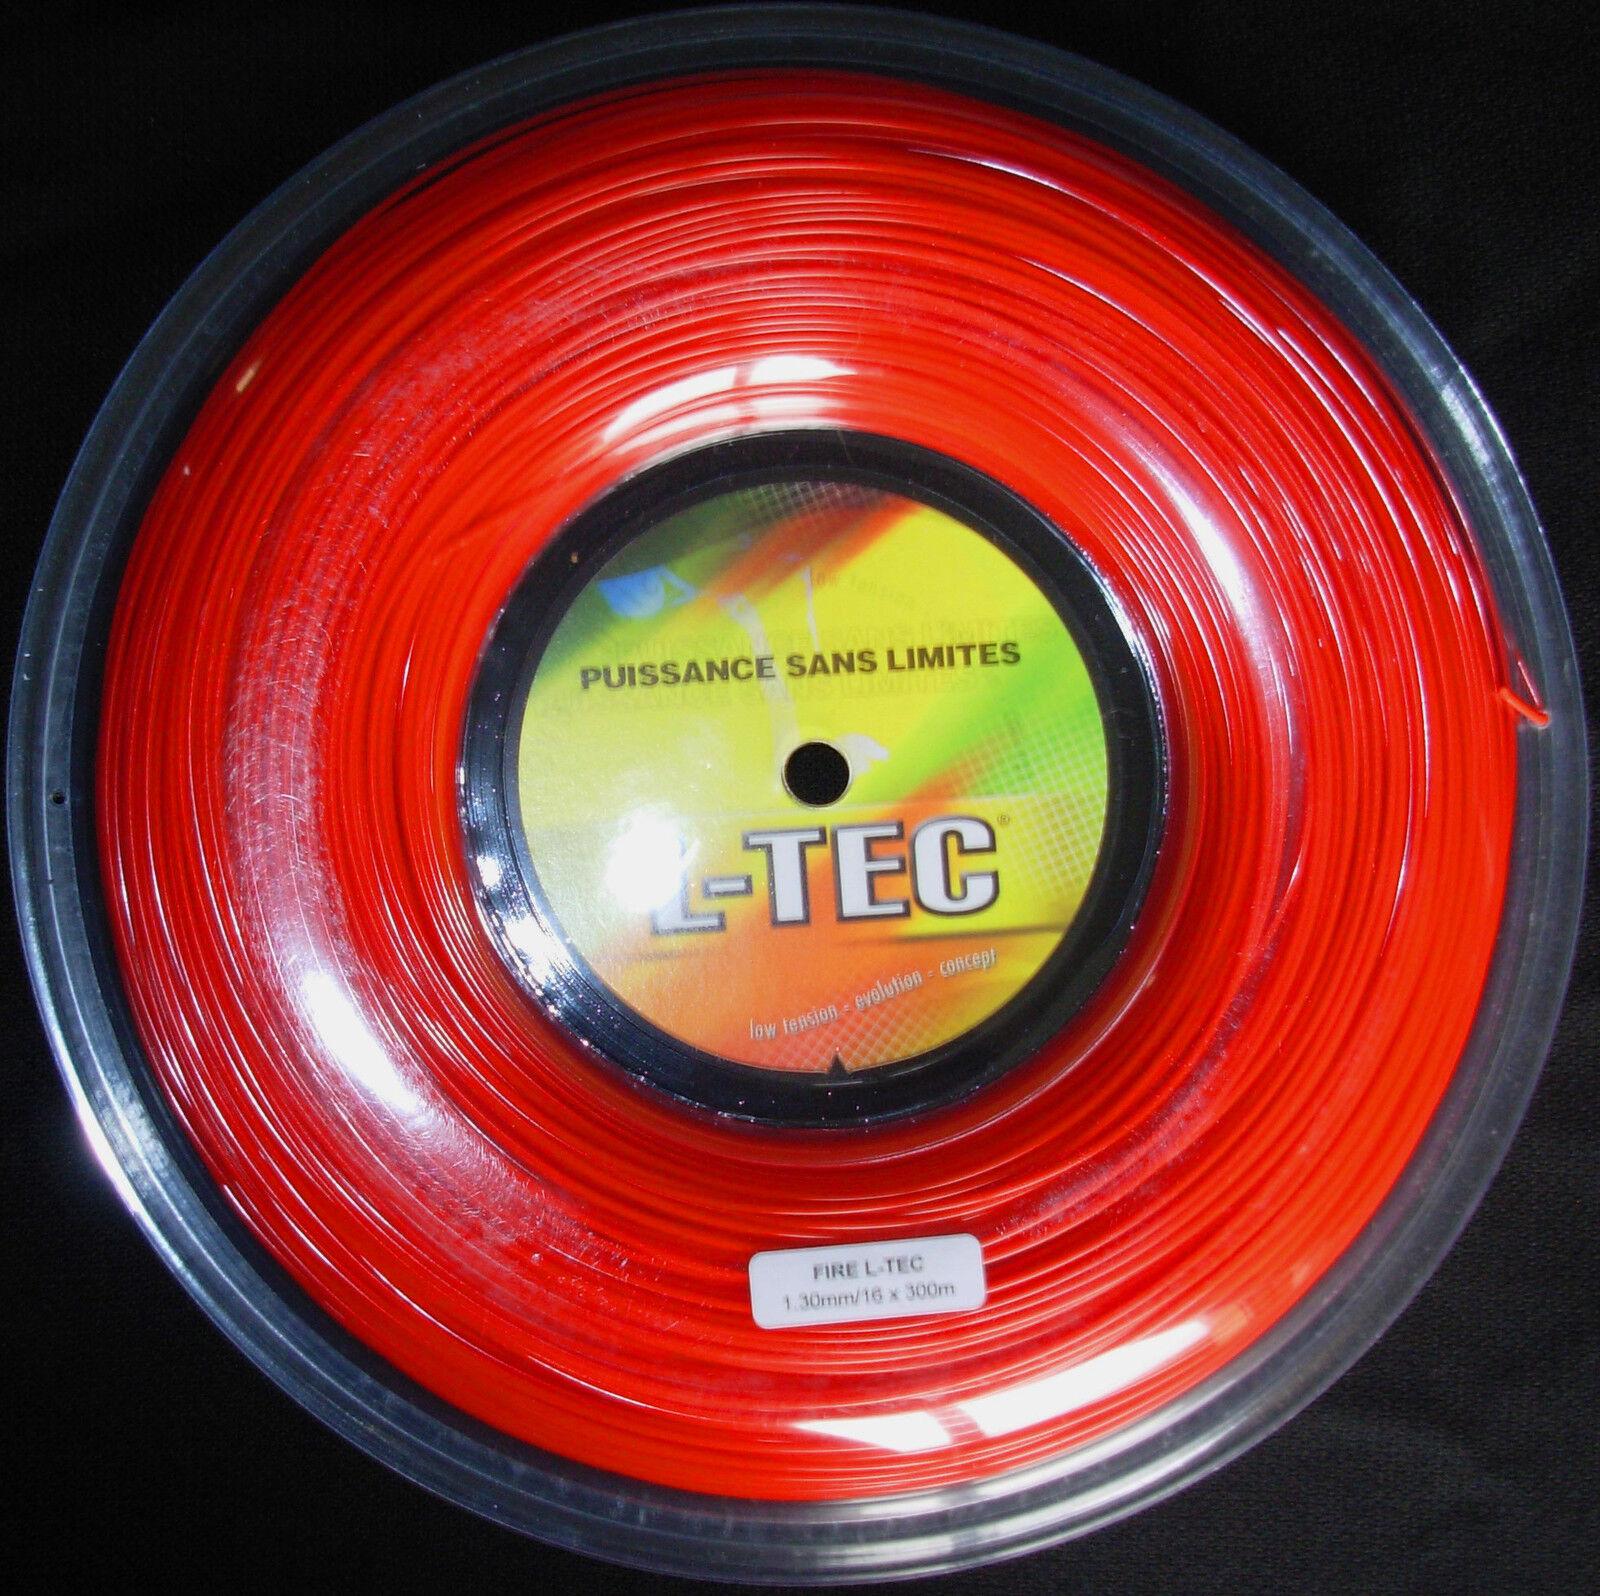 L TEC FIRE  BOBINE DE 300 m JAUGE 1.30 mm - 60 %